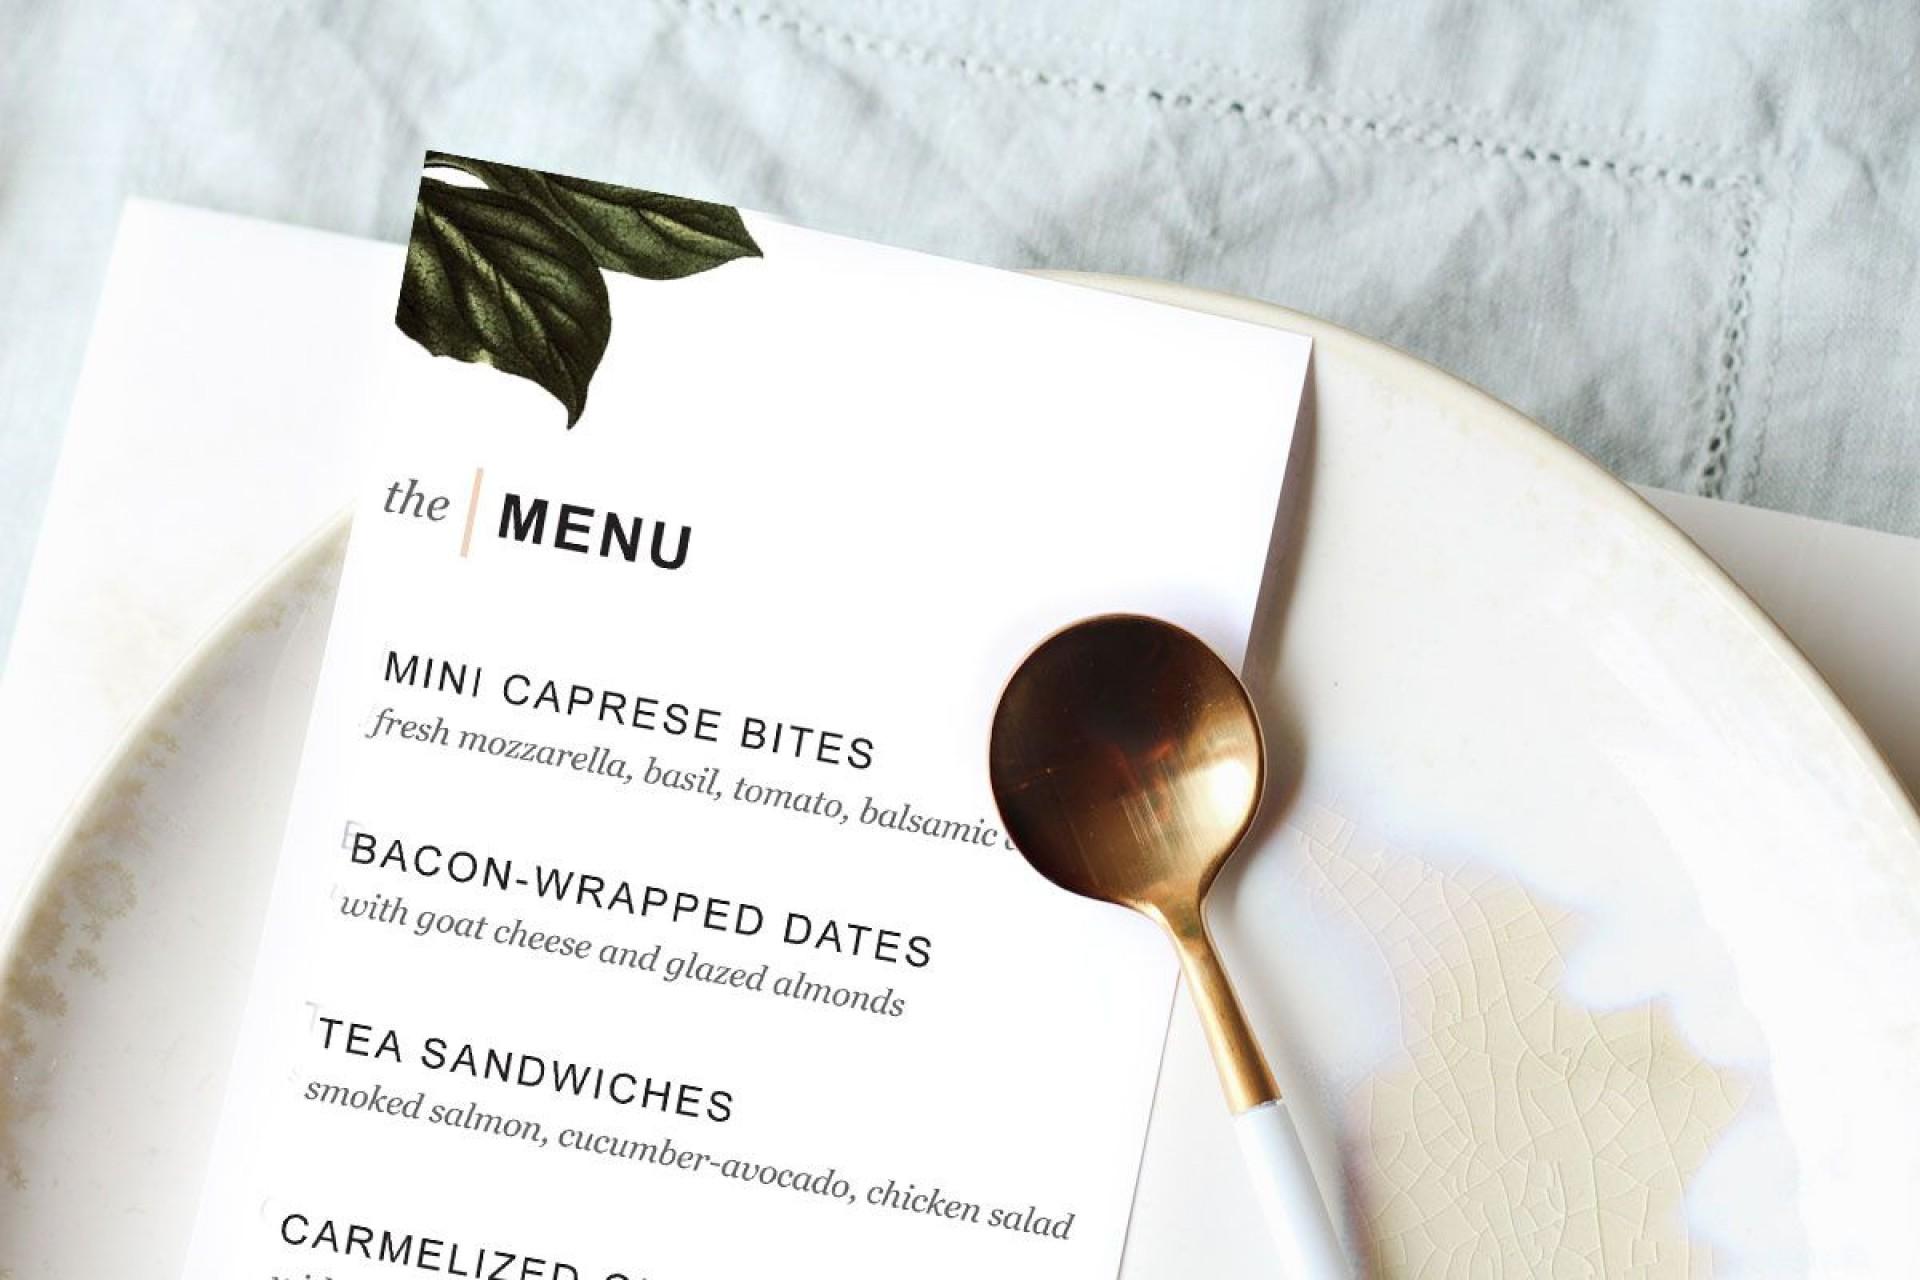 007 Impressive Dinner Party Menu Template Design  Word Elegant Free Google Doc1920